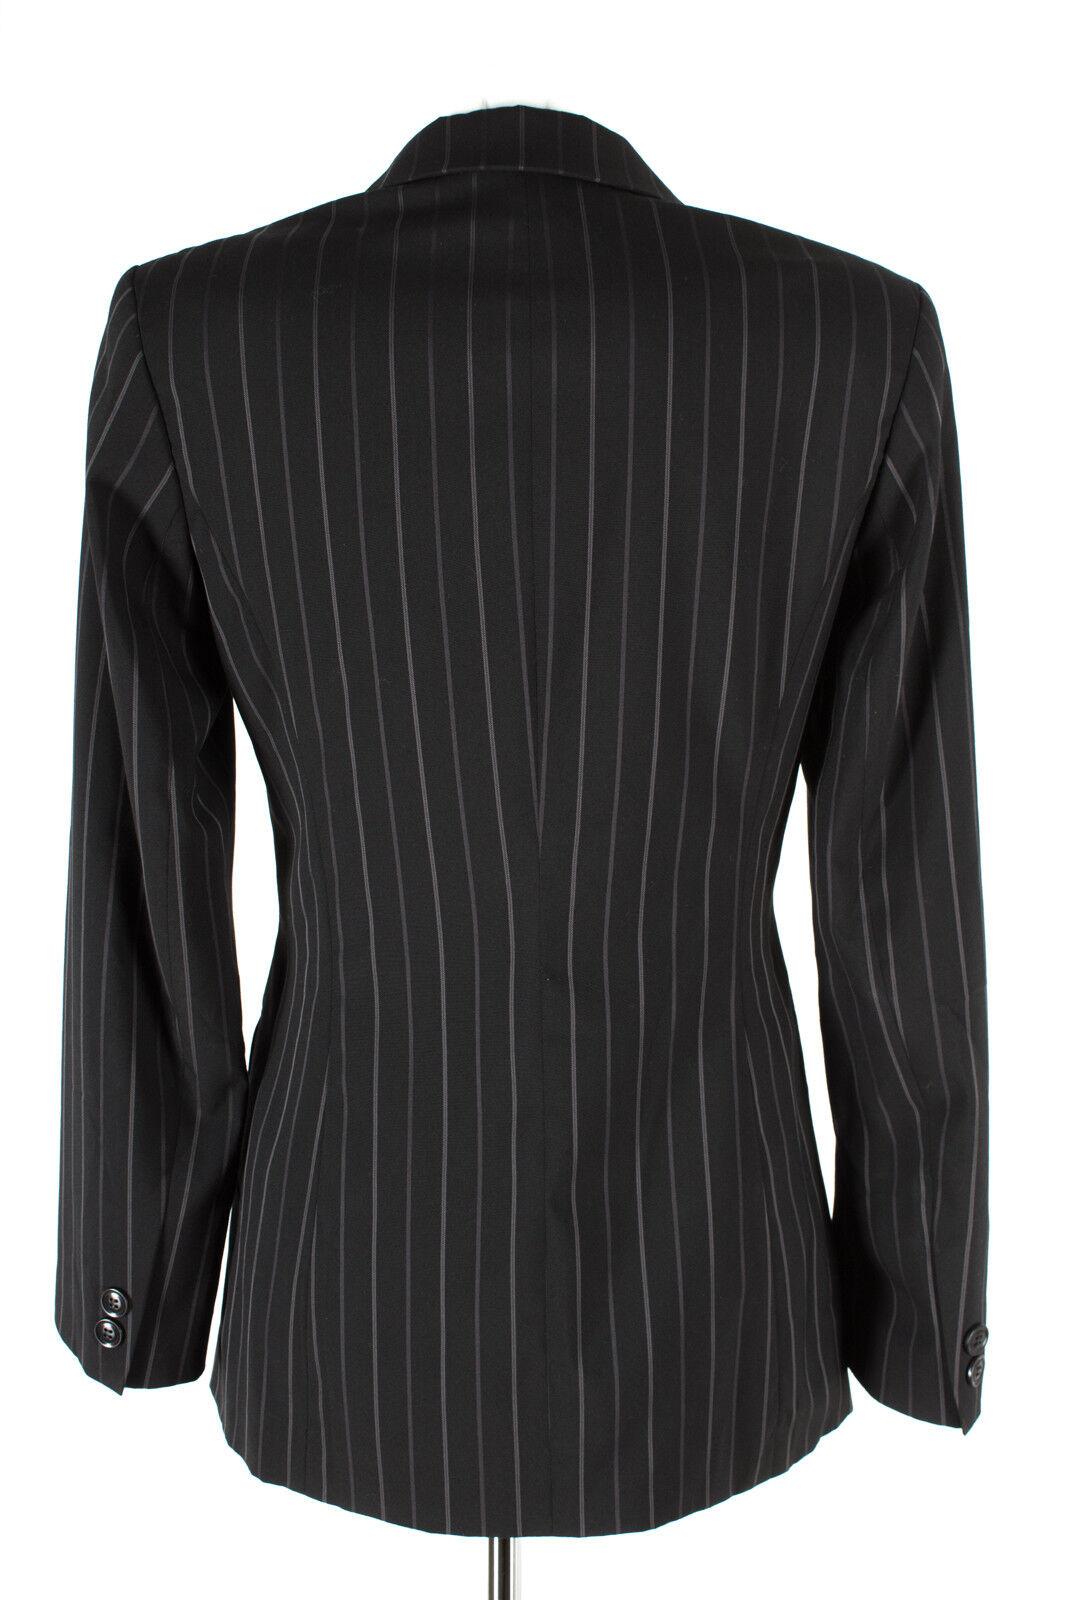 Oui pantaloni vestito Tg. 34 34 34 Blazer Pantaloni BUSINESS SUIT 2cf0a6